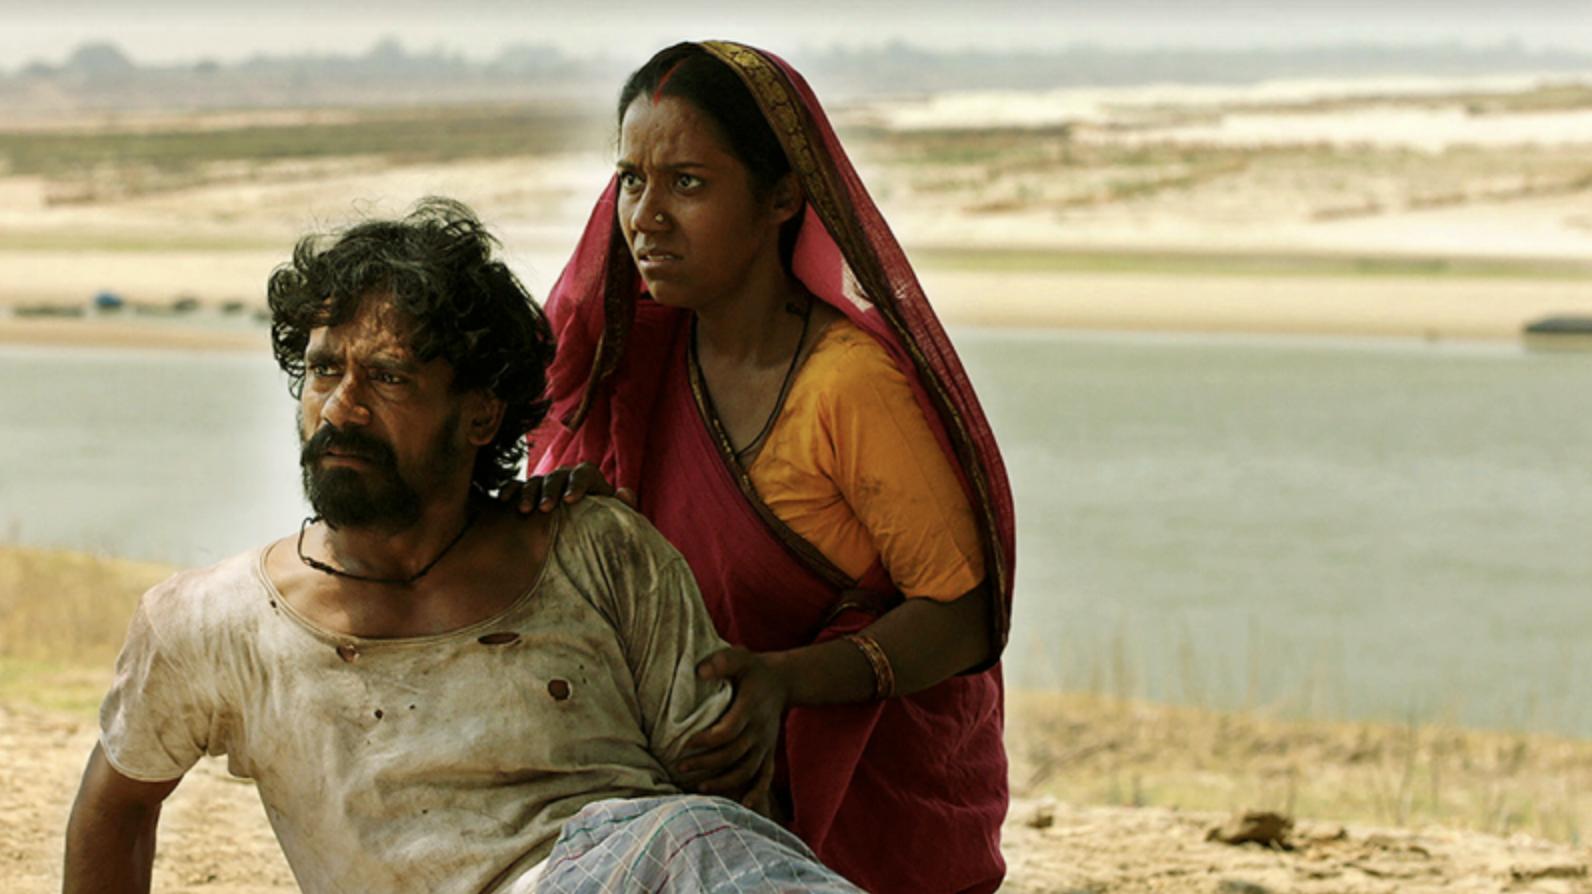 Jhalki (2019) by Brahmanand S Siingh. Photo courtesy: Singapore South Asian International Film Festival (Sg.SAIFF)